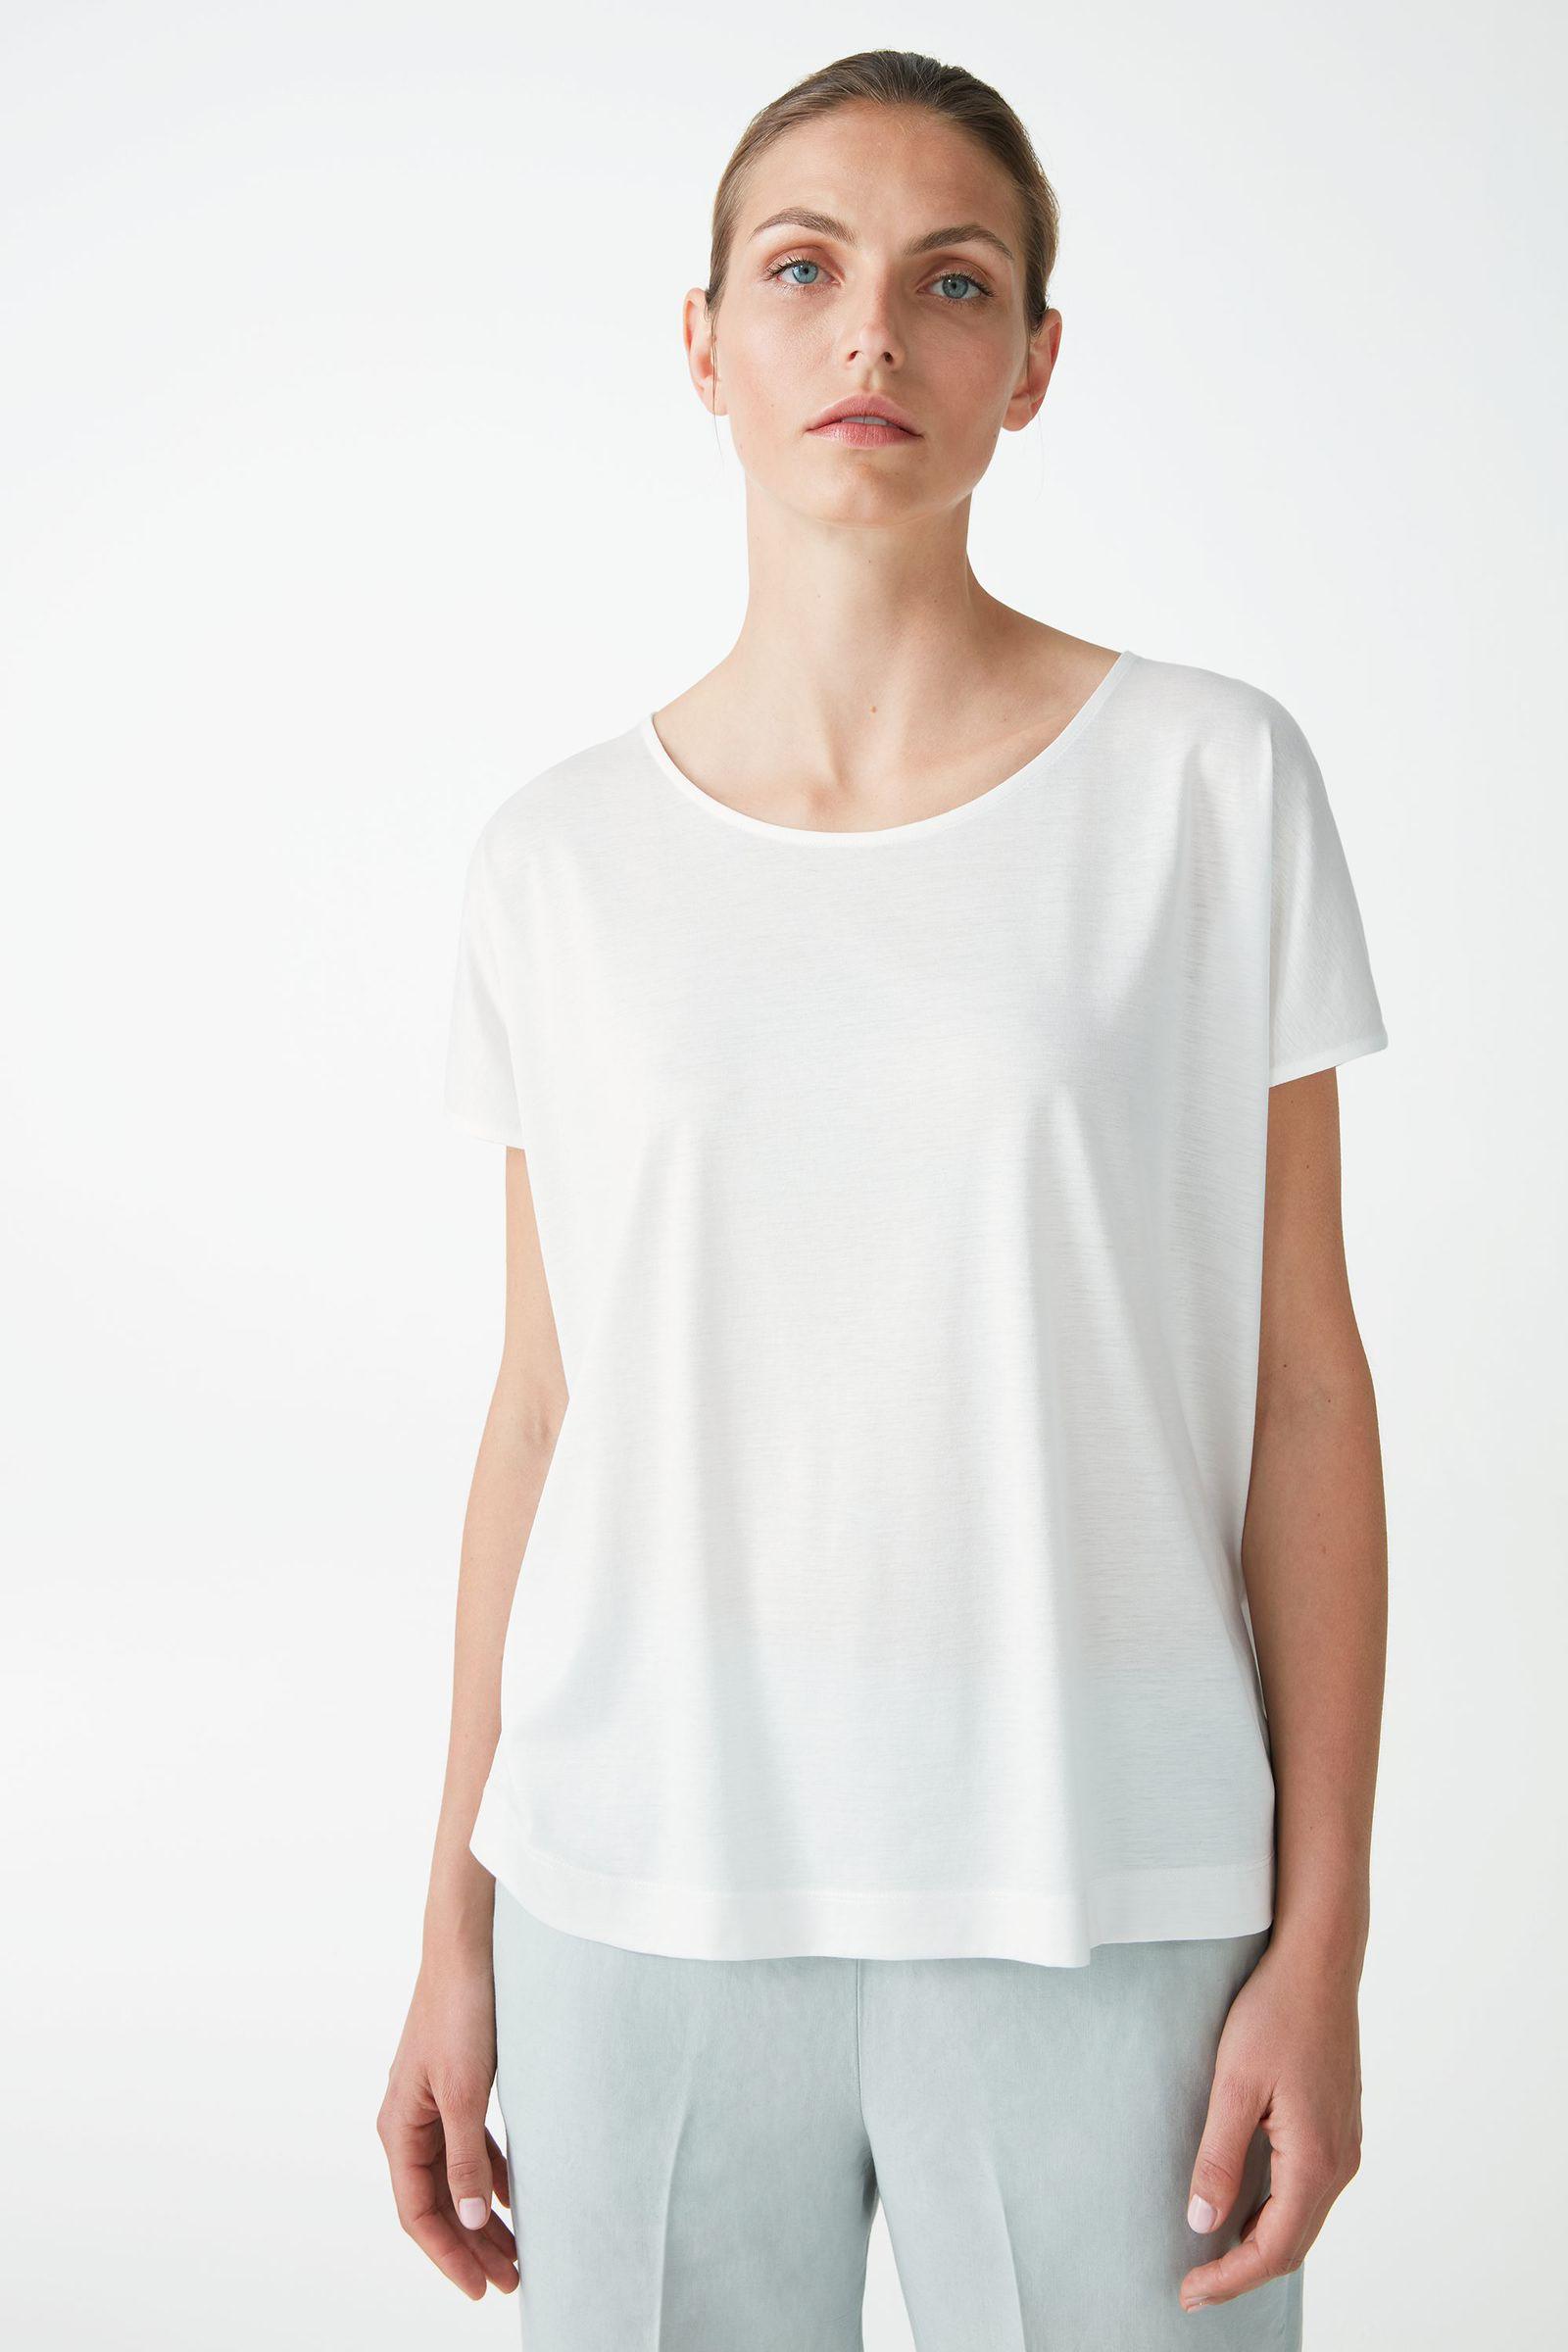 COS 라이오셀 오가닉 코튼 믹스 스퀘어 컷 티셔츠의 화이트컬러 ECOMLook입니다.